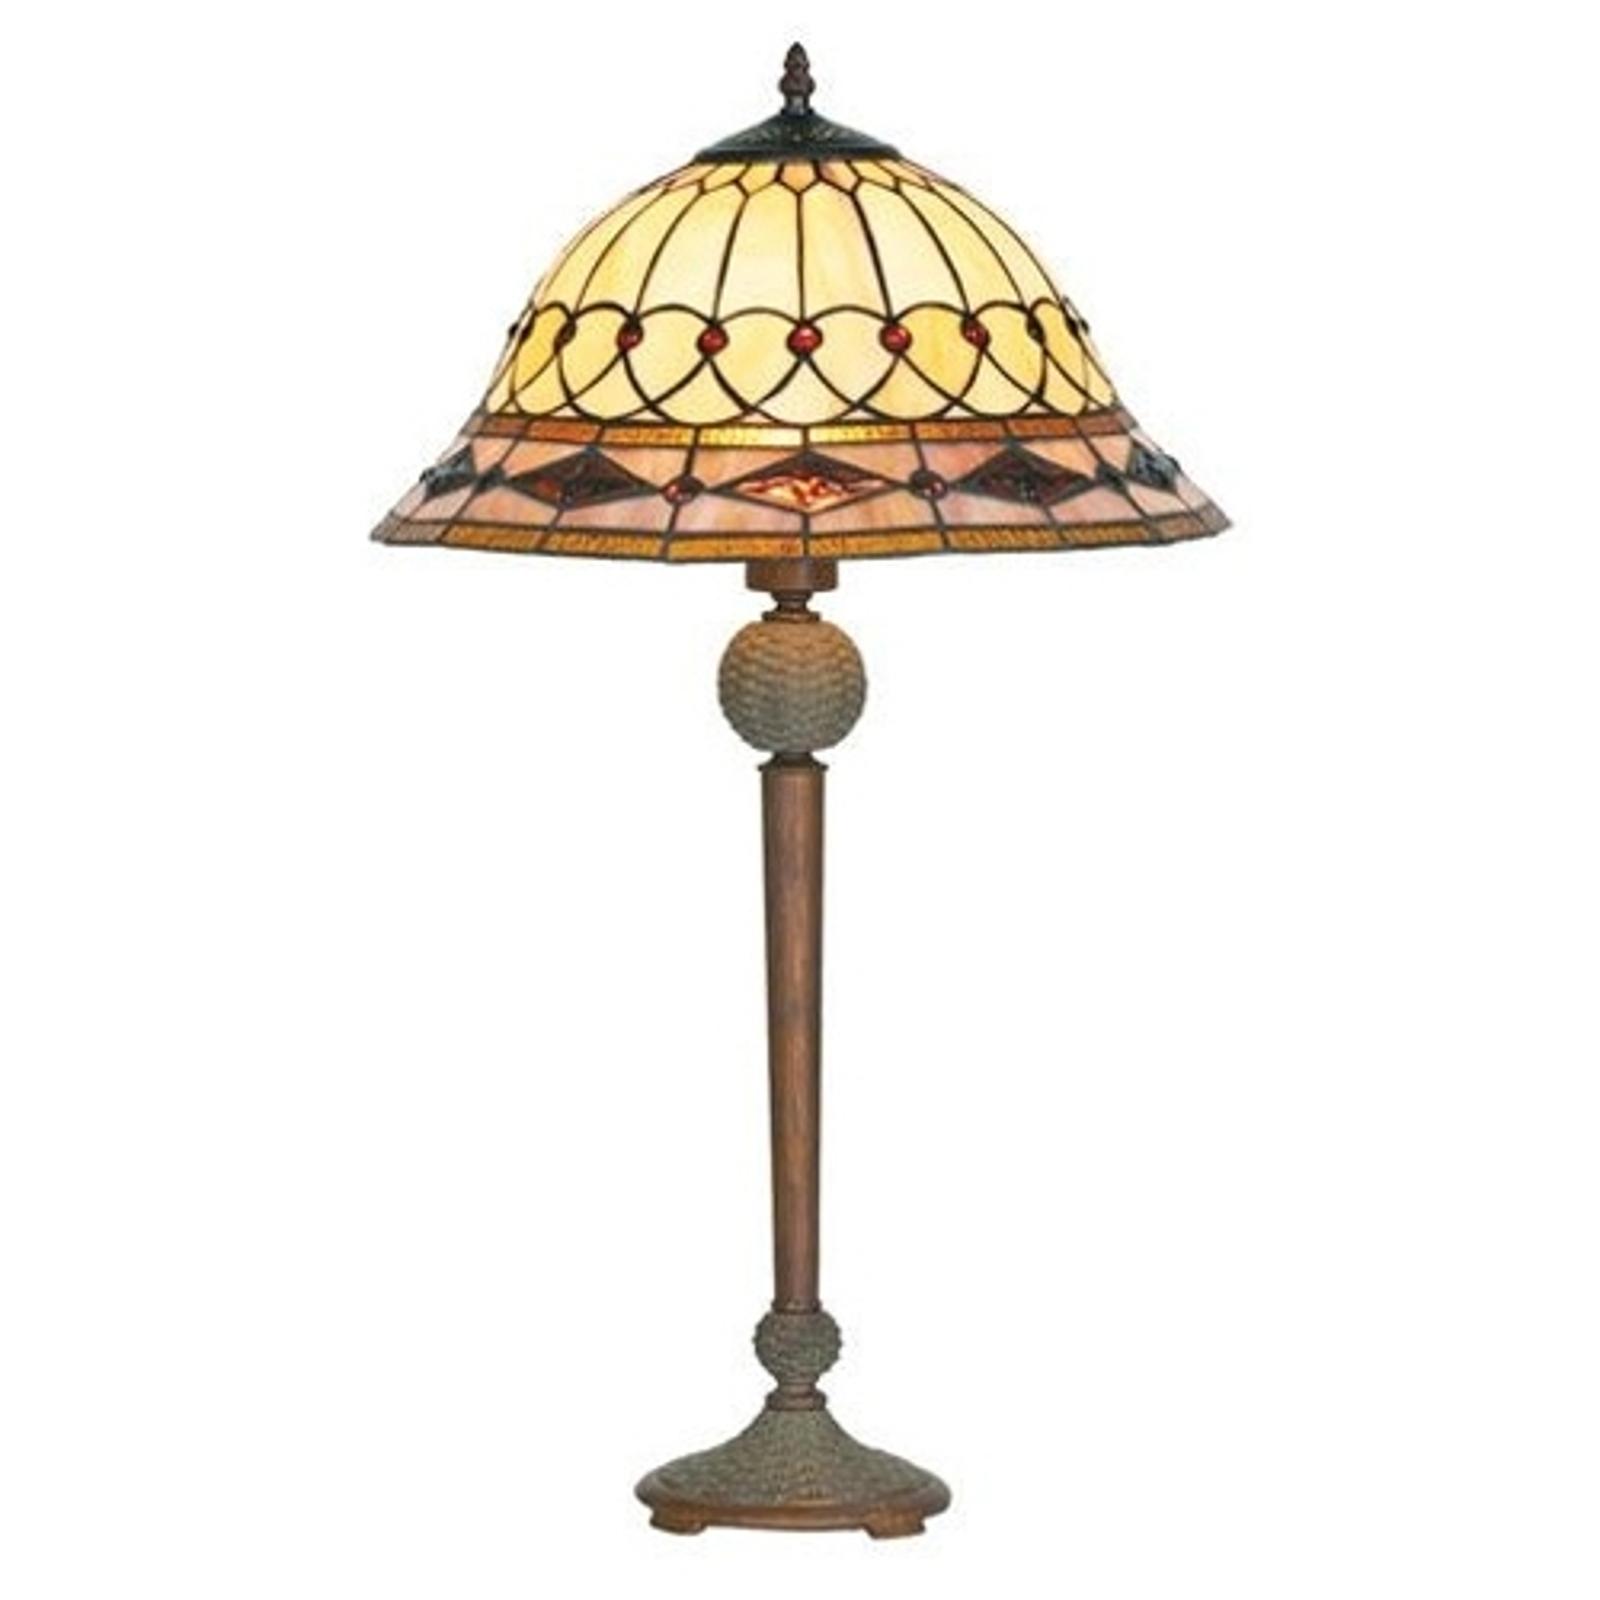 KASSANDRA - bordlampe i Tiffany stil